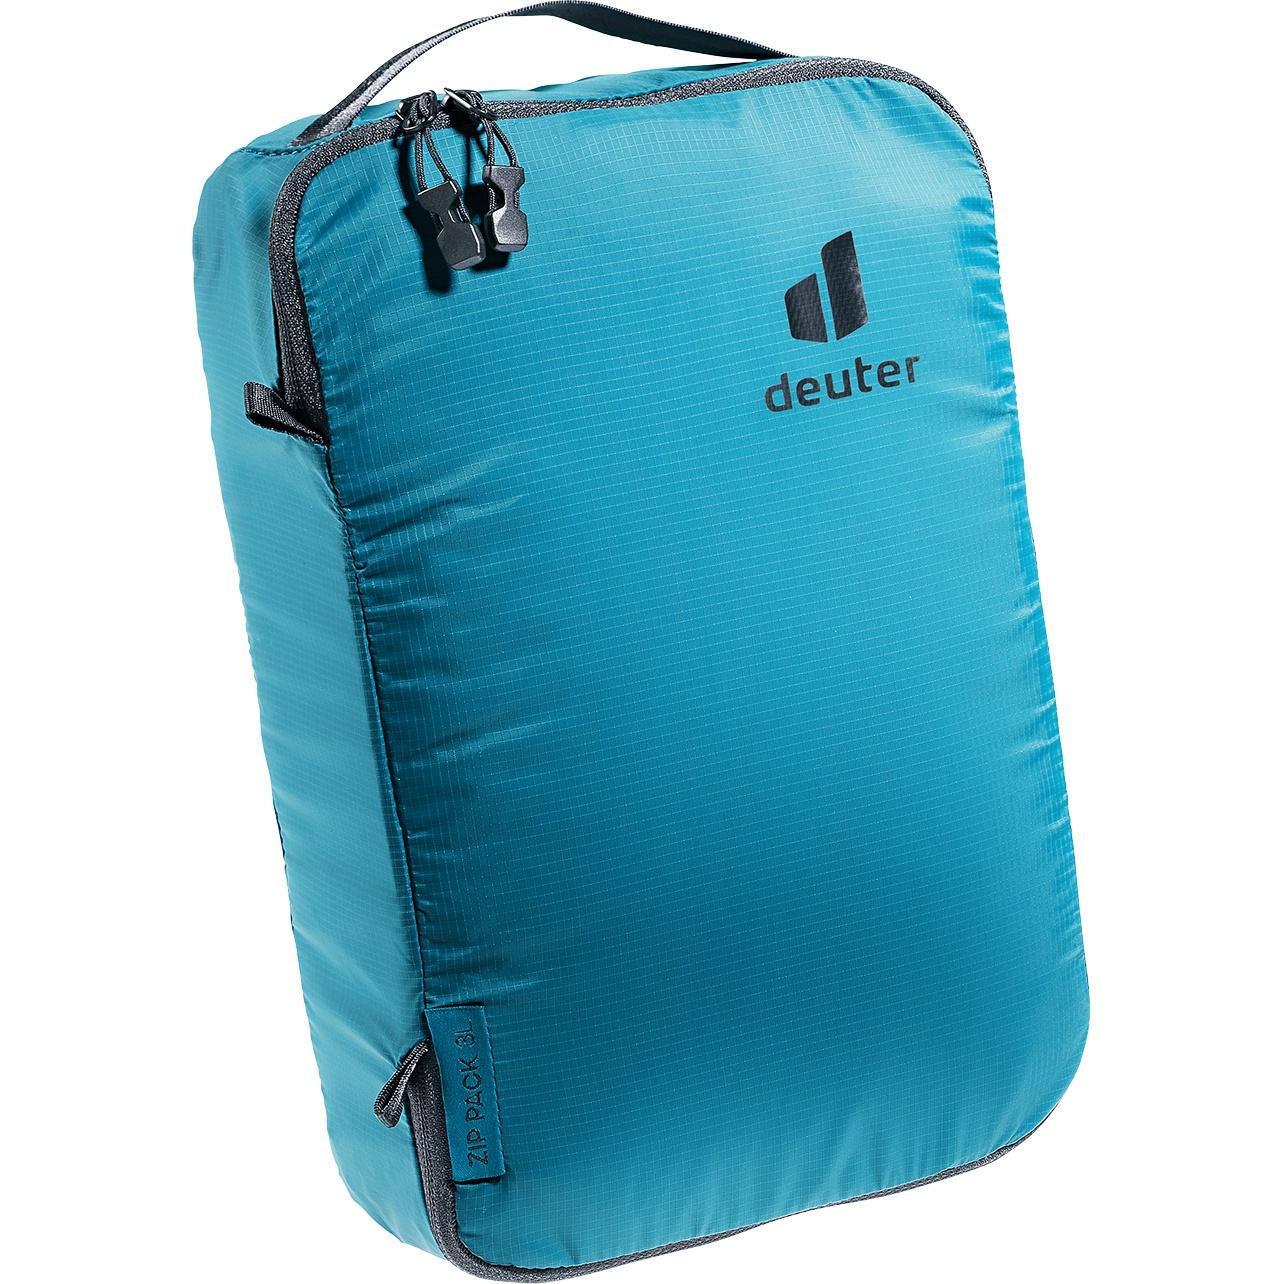 Deuter Zip Pack 3 liters - denim